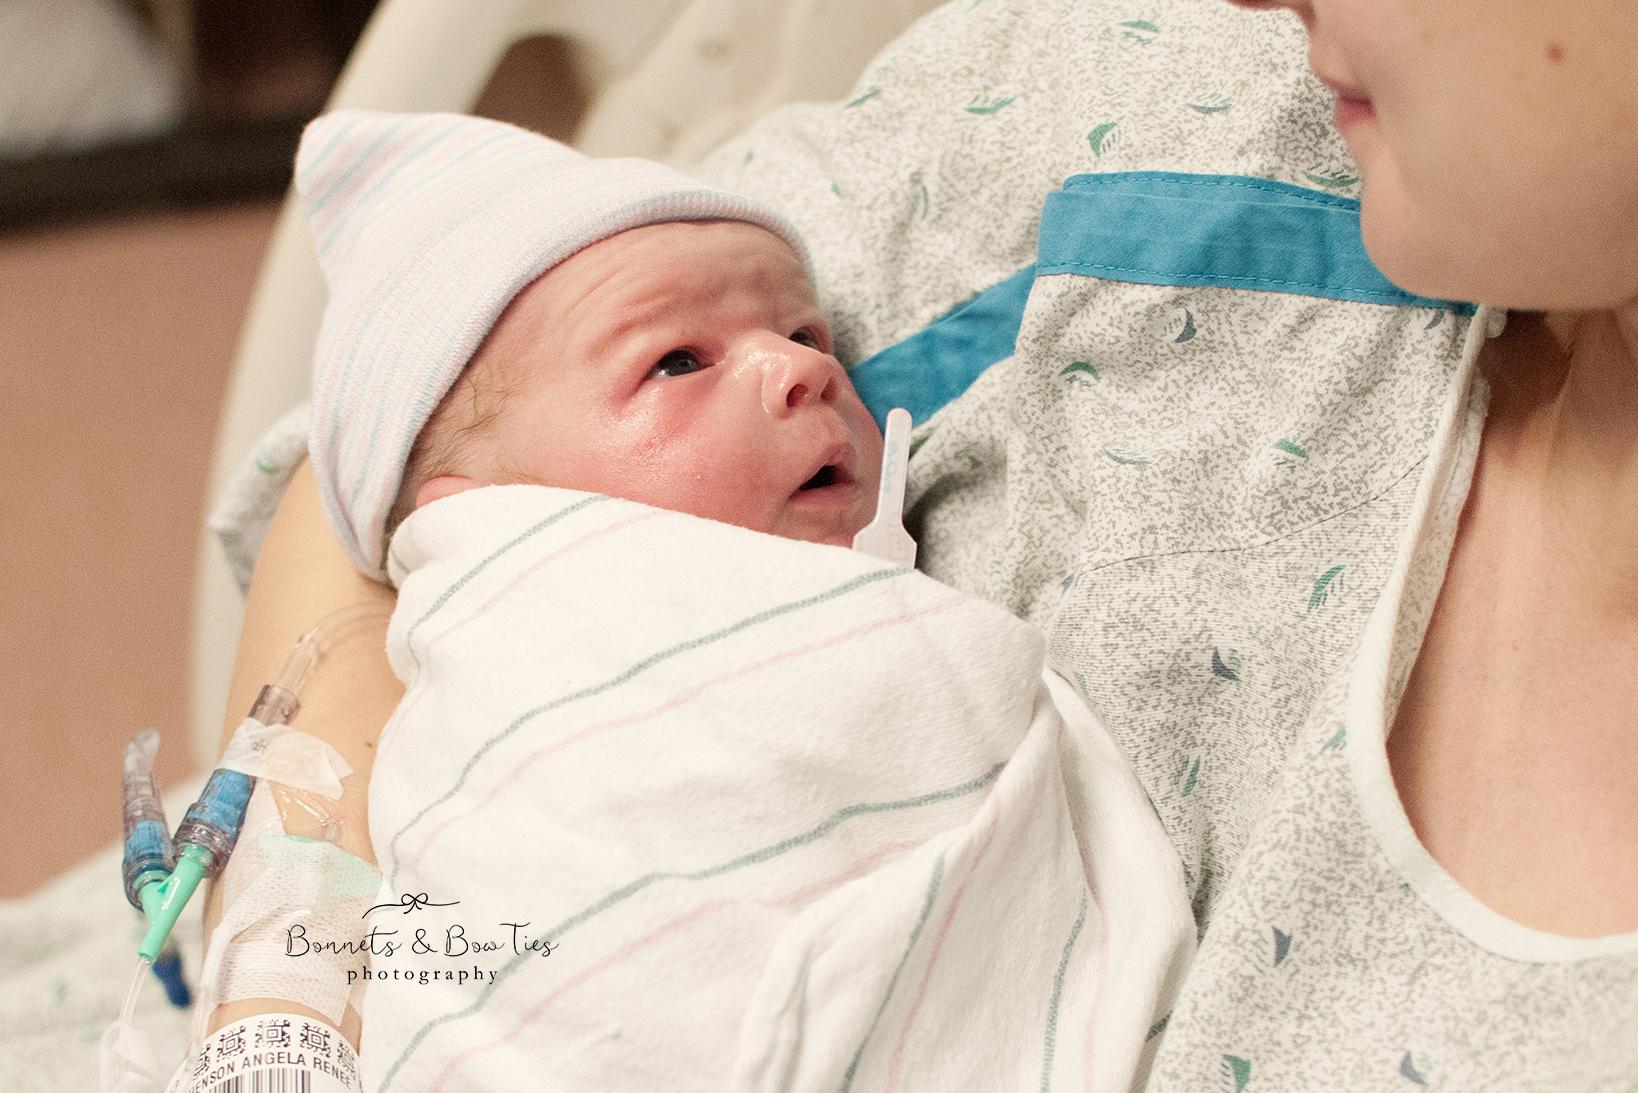 birth photographer in york haven pa.jpg